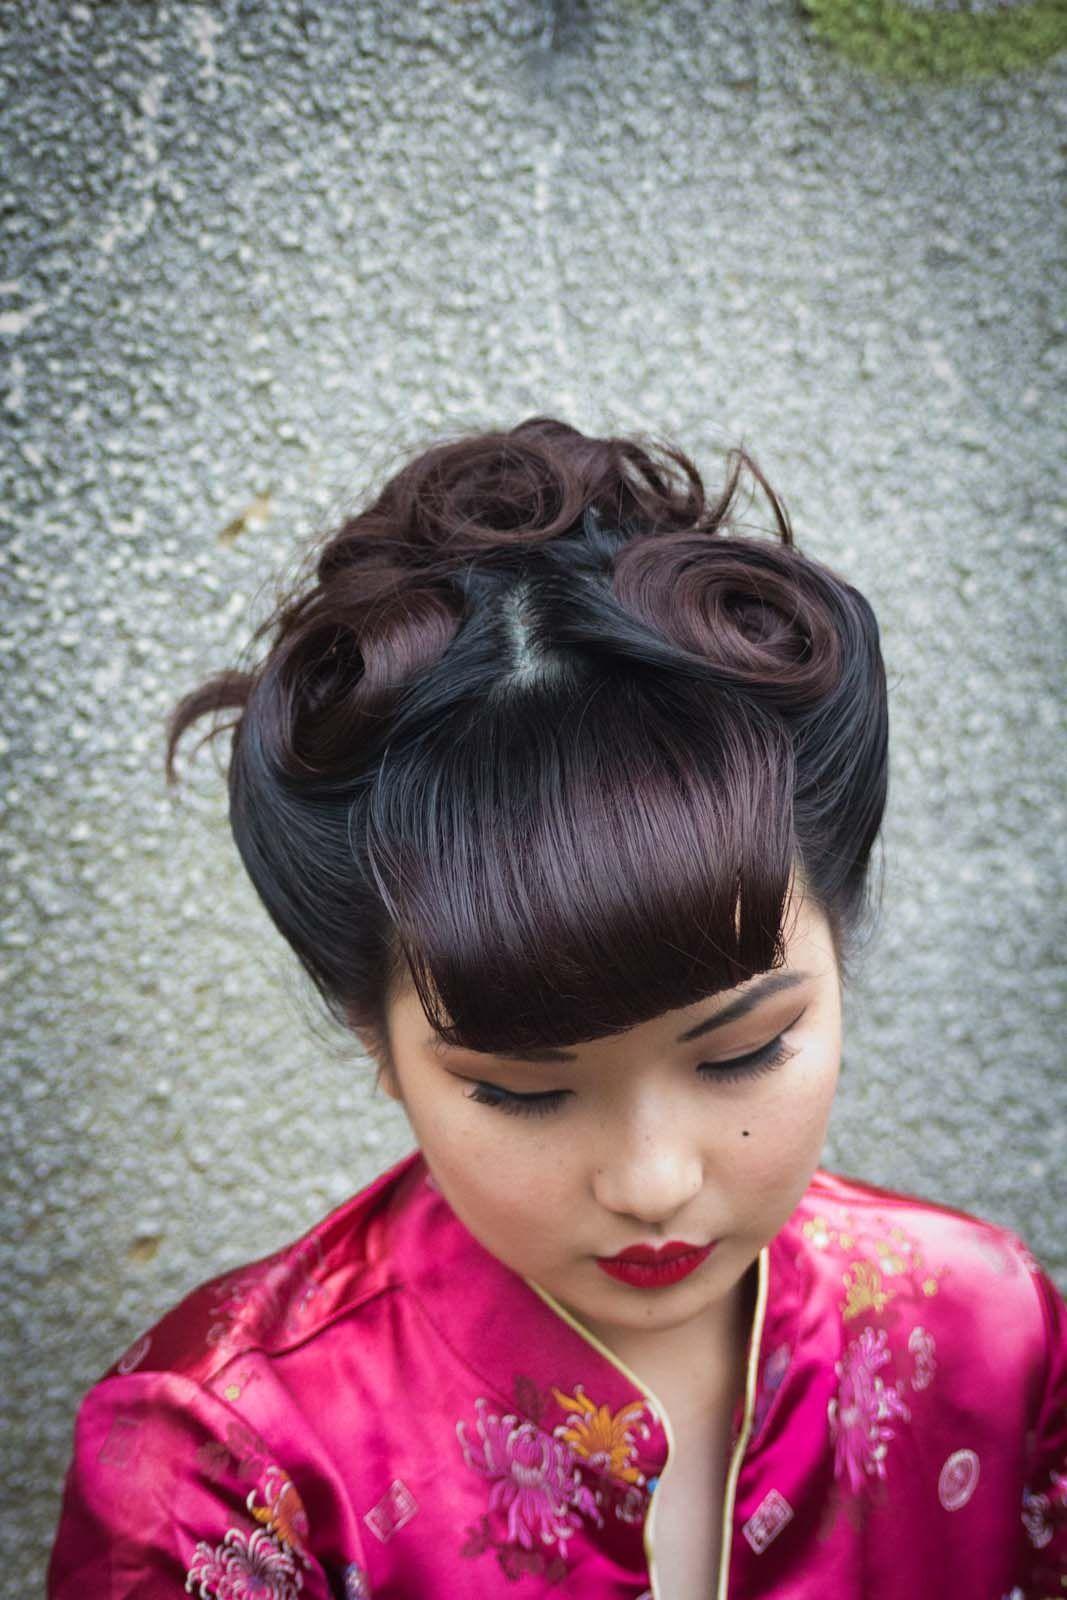 Bella Noell Vintage MakeUp Artist and Hair Stylist